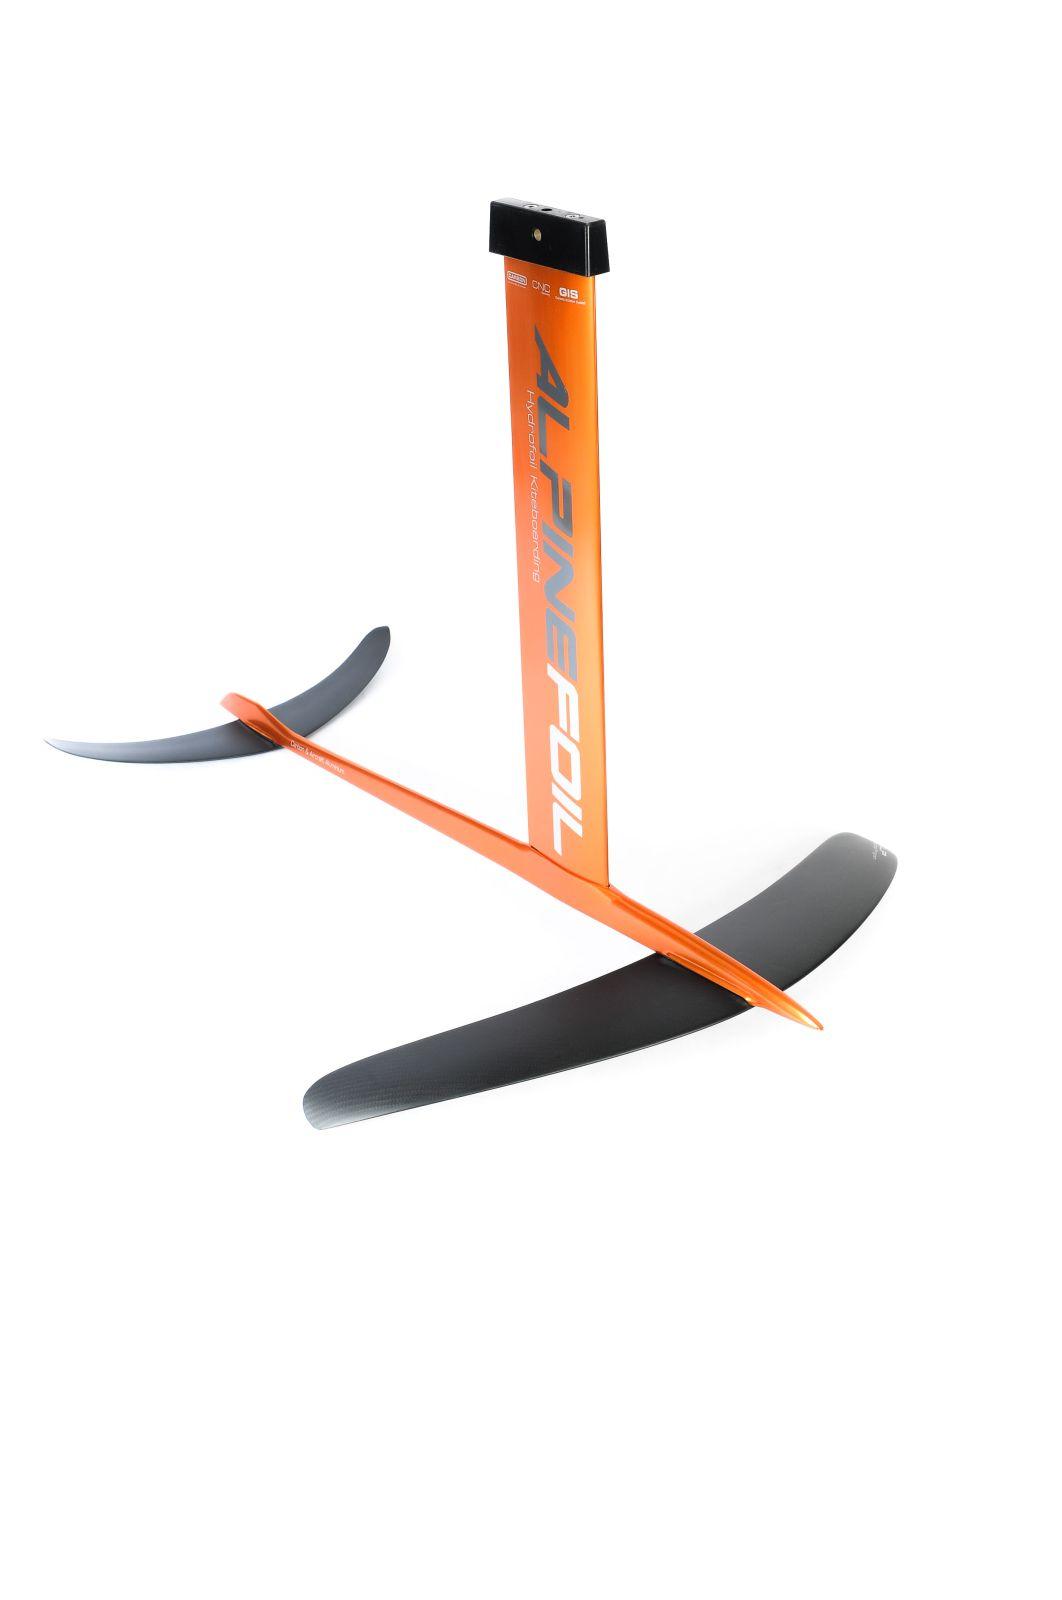 Kitefoil carbon aluminium alpinefoil 5 0 access v2 2919 1